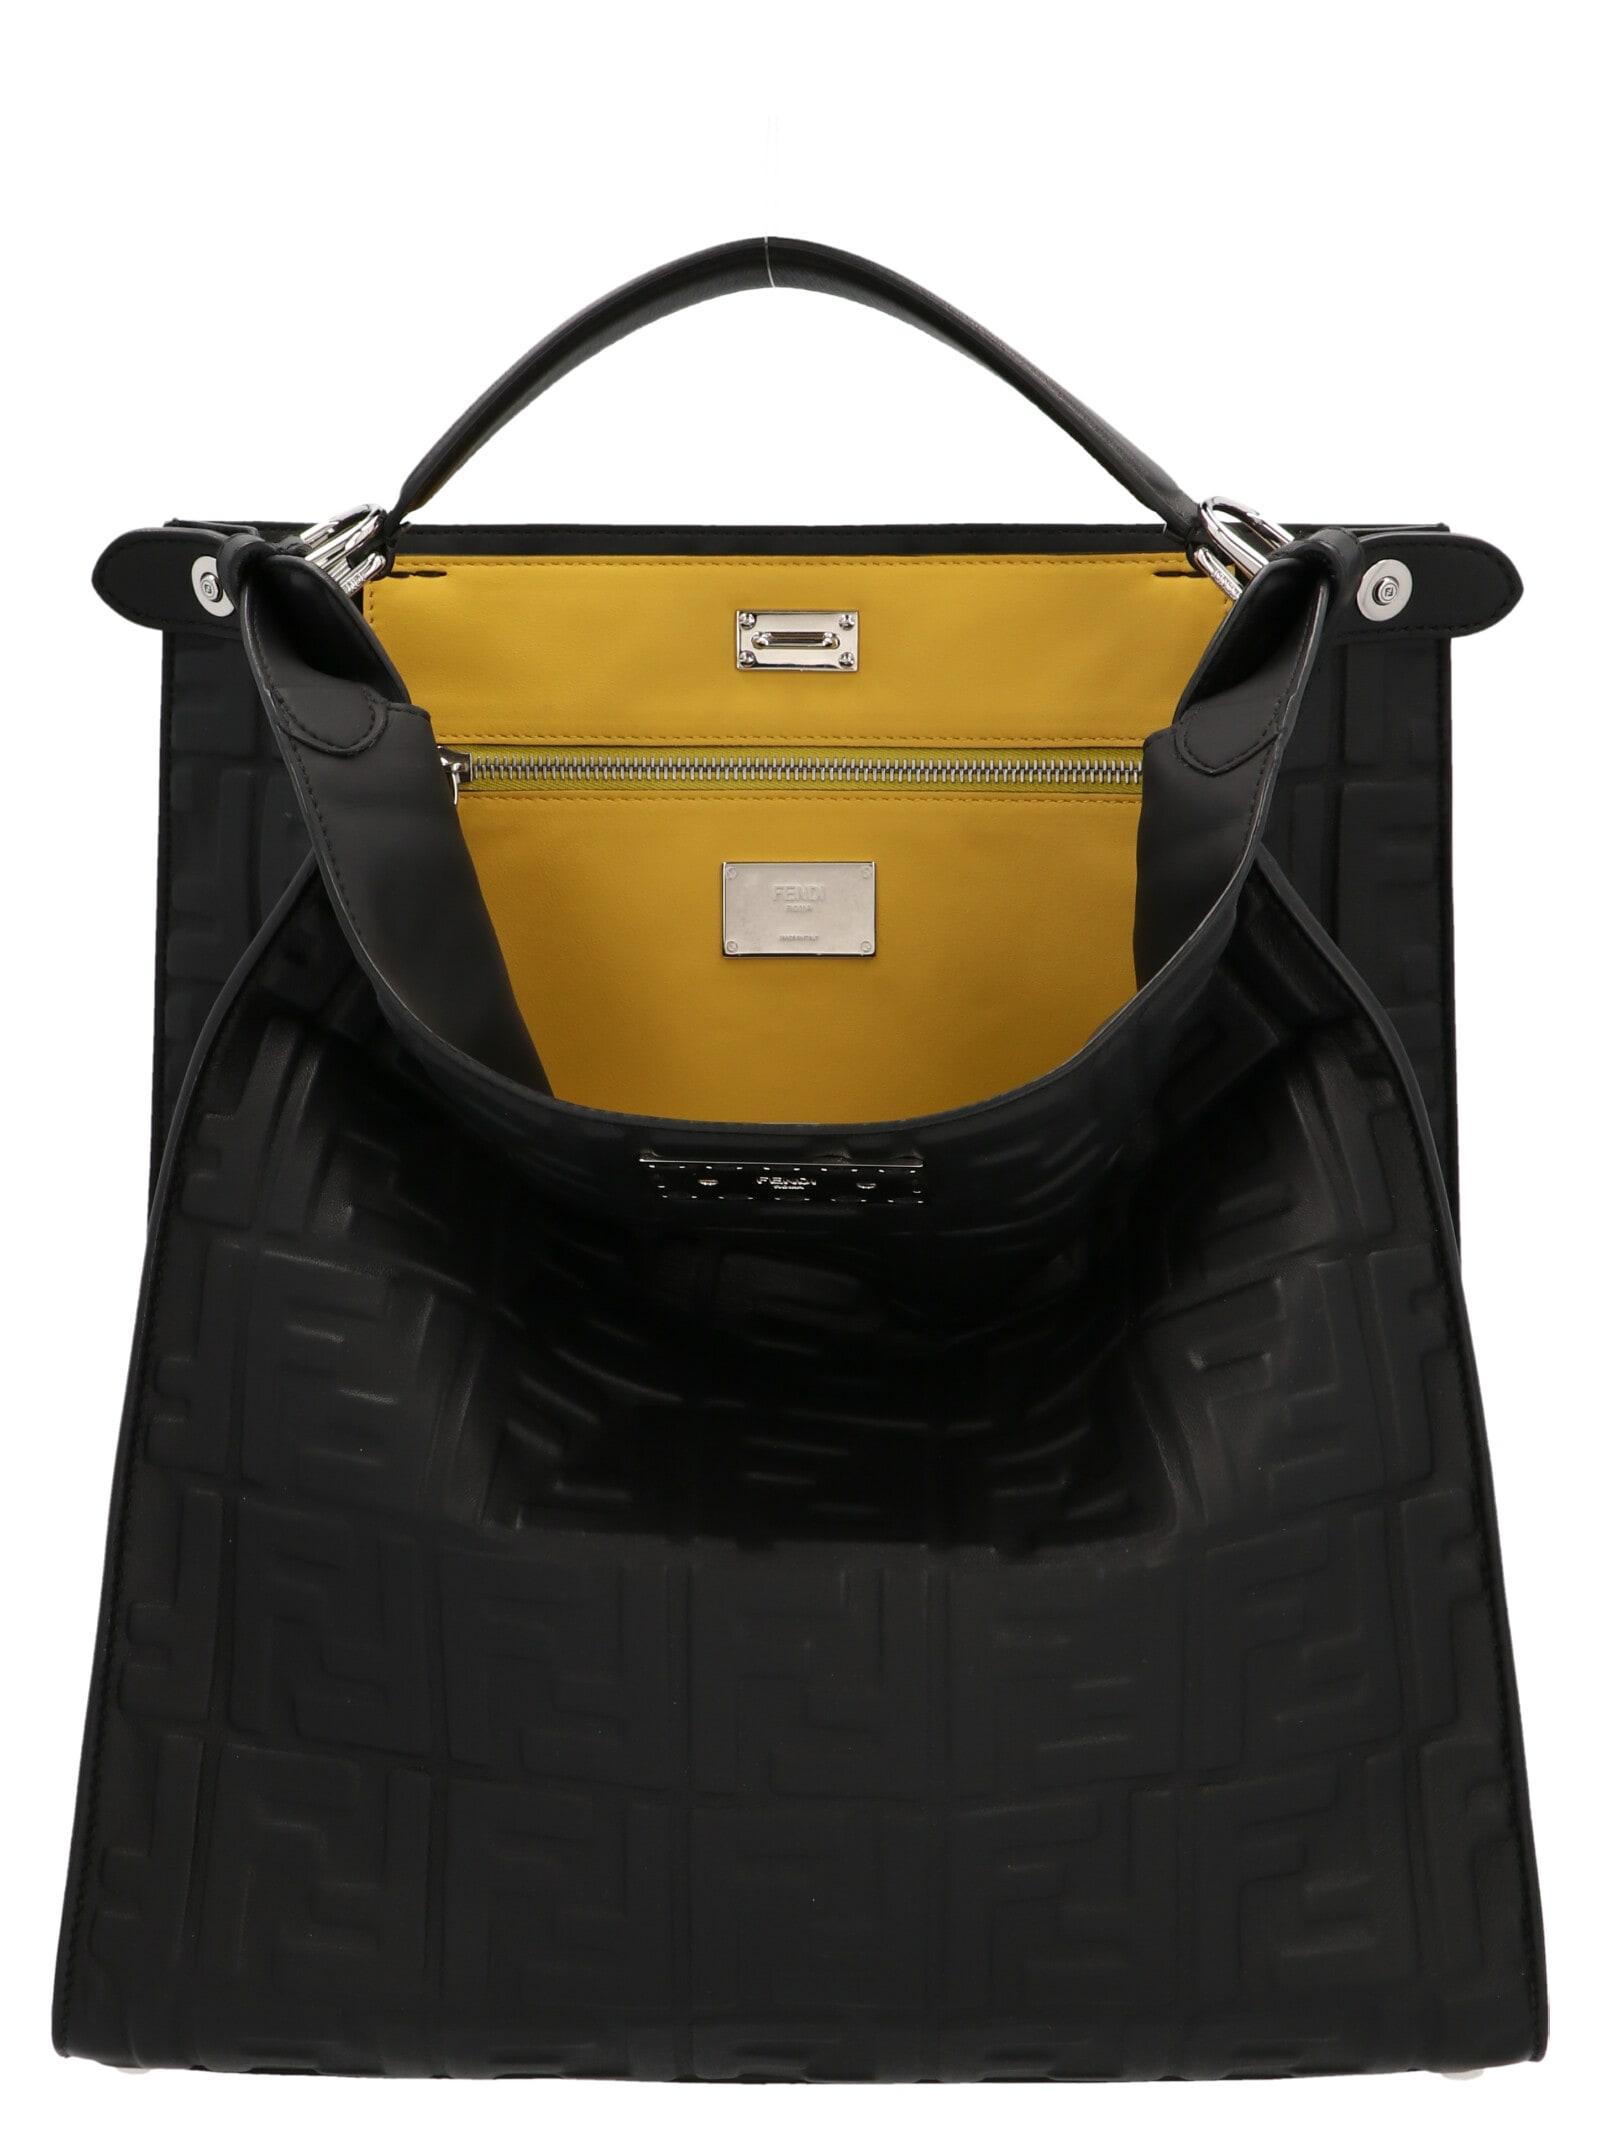 Fendi PEEKABOO X-LITE BAG